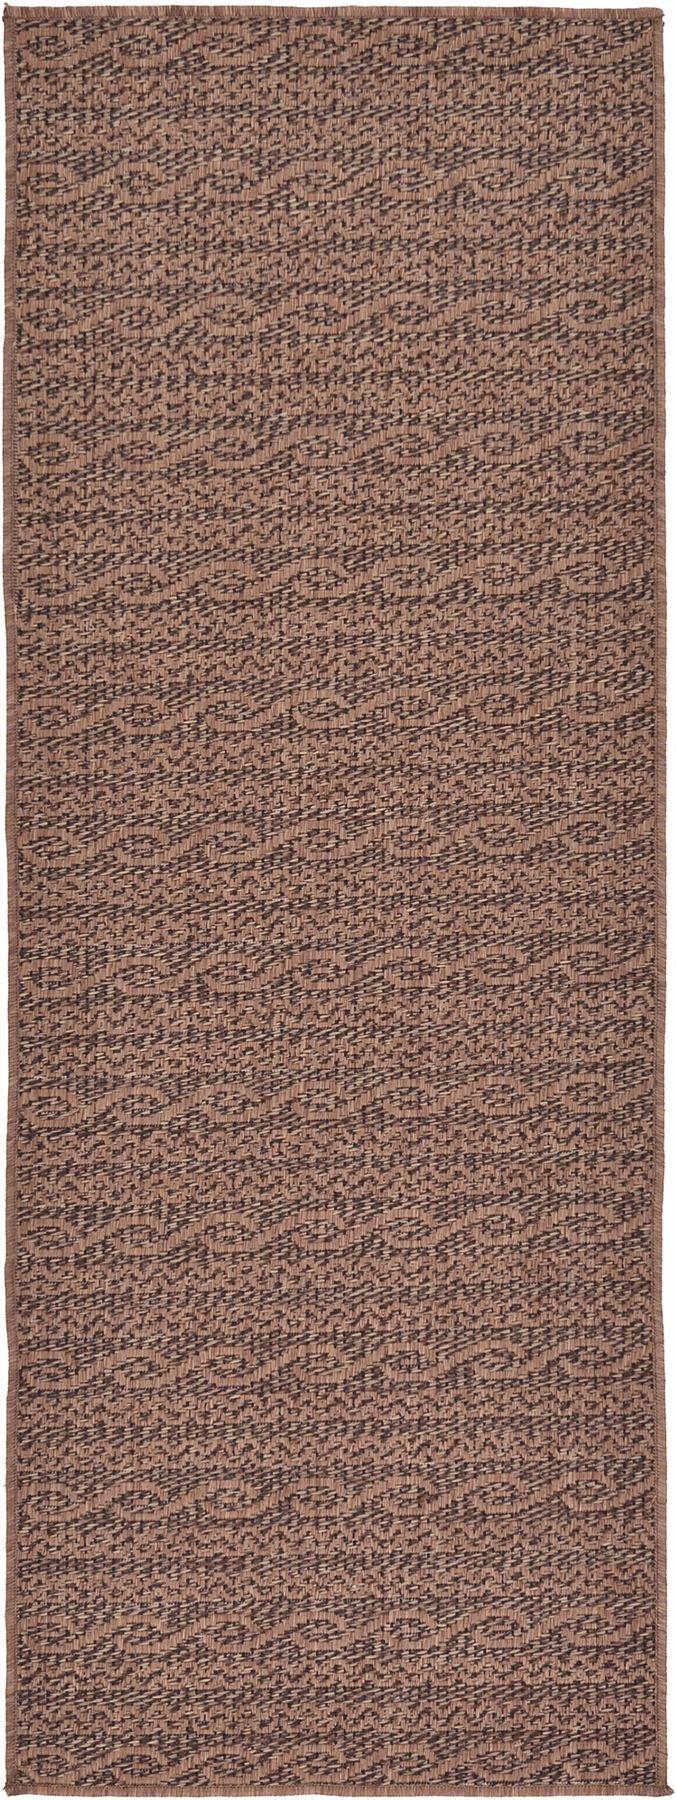 Outdoor Patio Carpet Squares: Contemporary Patio,Pool,Camp And Picnic Carpet Outdoor Rug